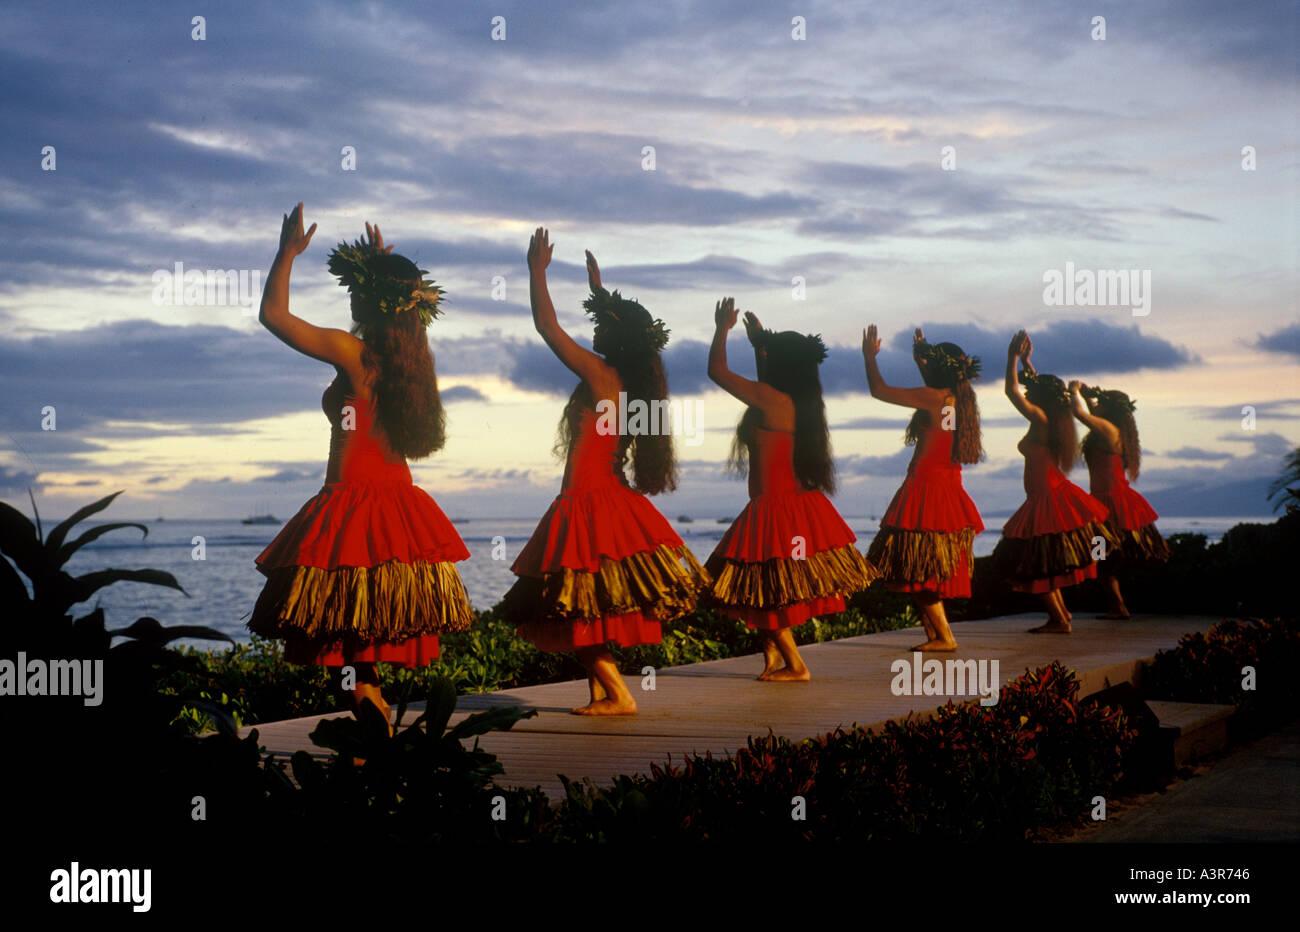 tradition hawaiian dancers preforming a hula at a luau in Lahaina Maui Hawaii - Stock Image